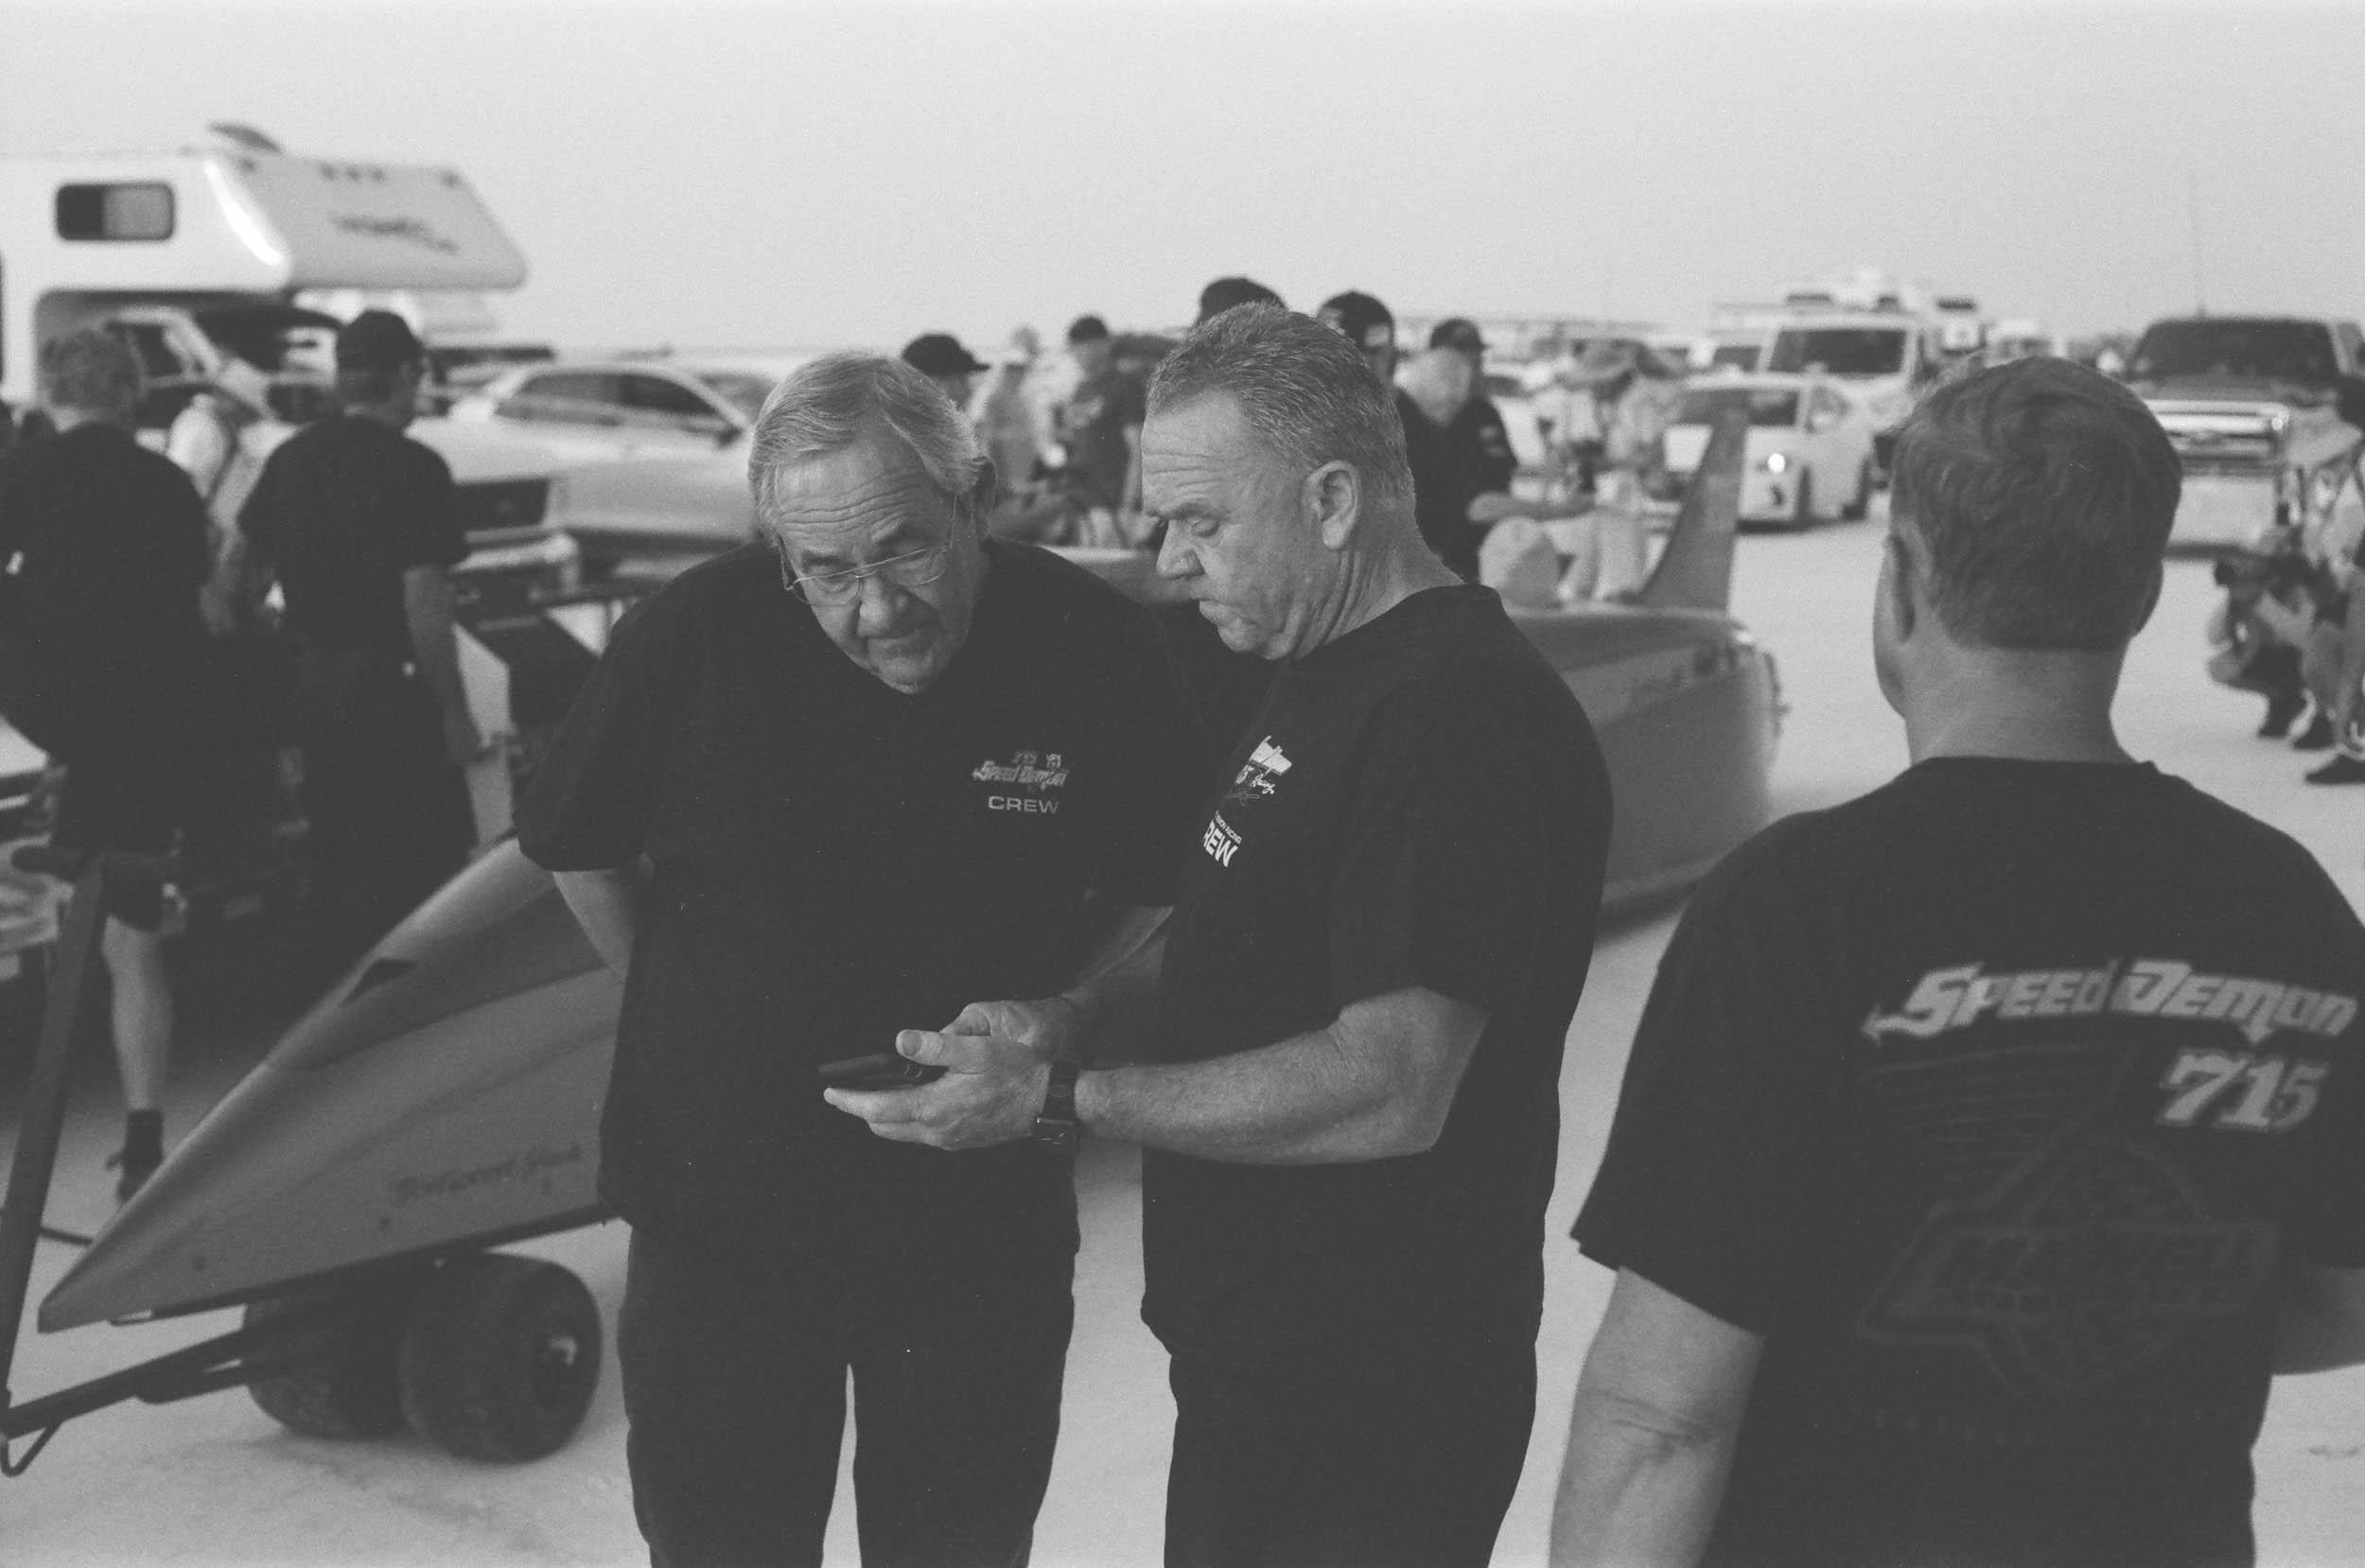 The two crew chiefs of the Speed Demon team streamliner, Kenny Duttweiler (left) and Steve Watt.